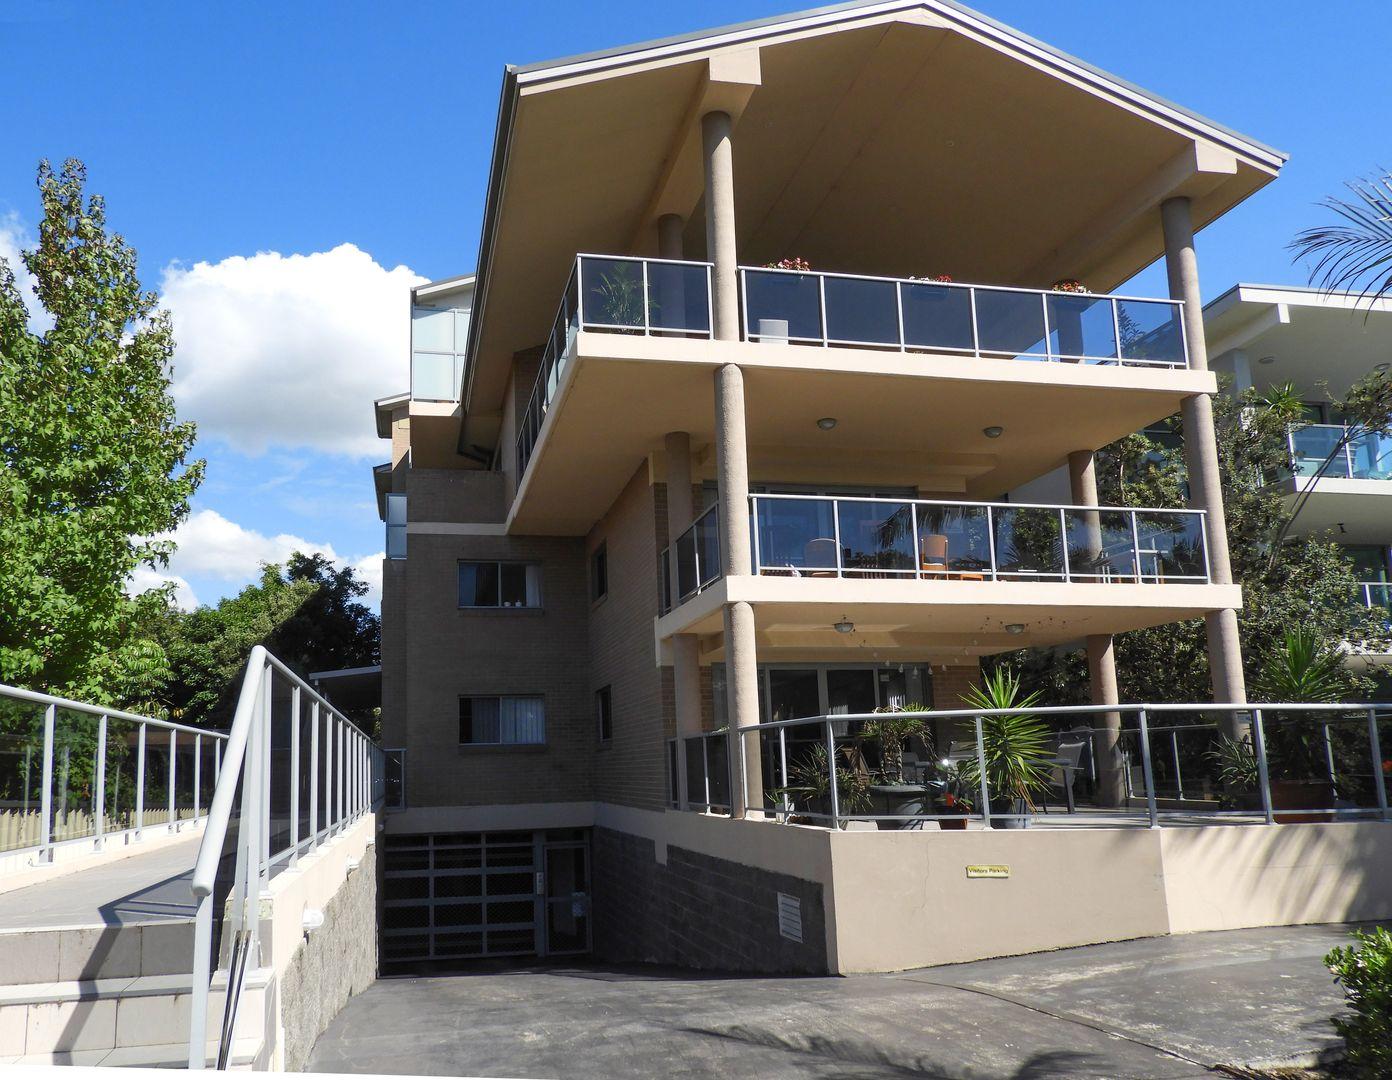 6/8 Virginia Street, Wollongong NSW 2500, Image 0